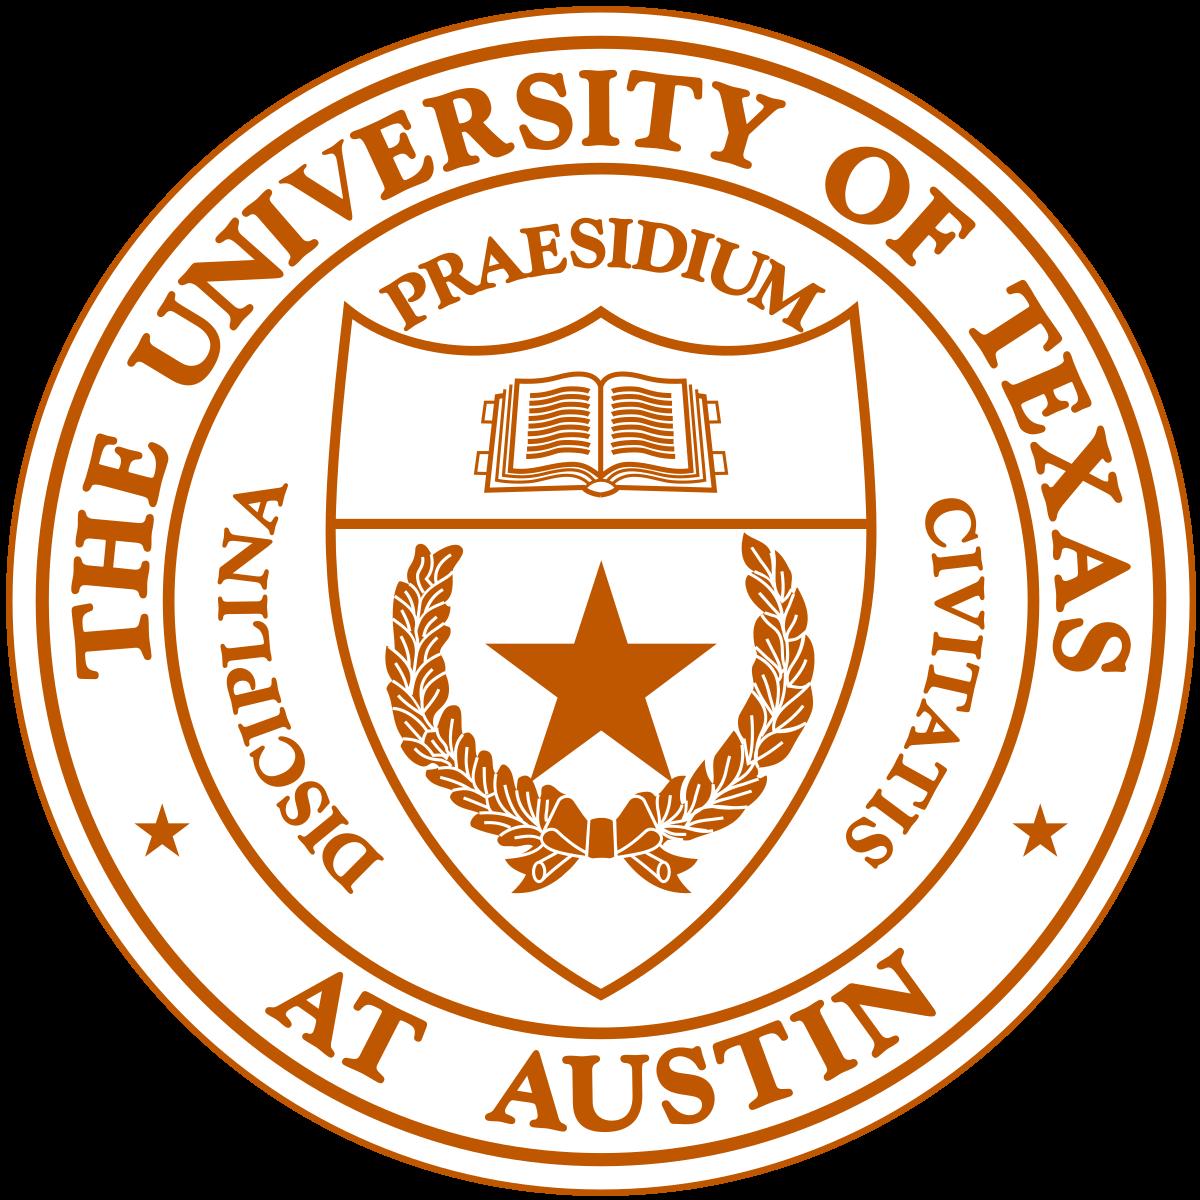 1200px-University_of_Texas_at_Austin_seal